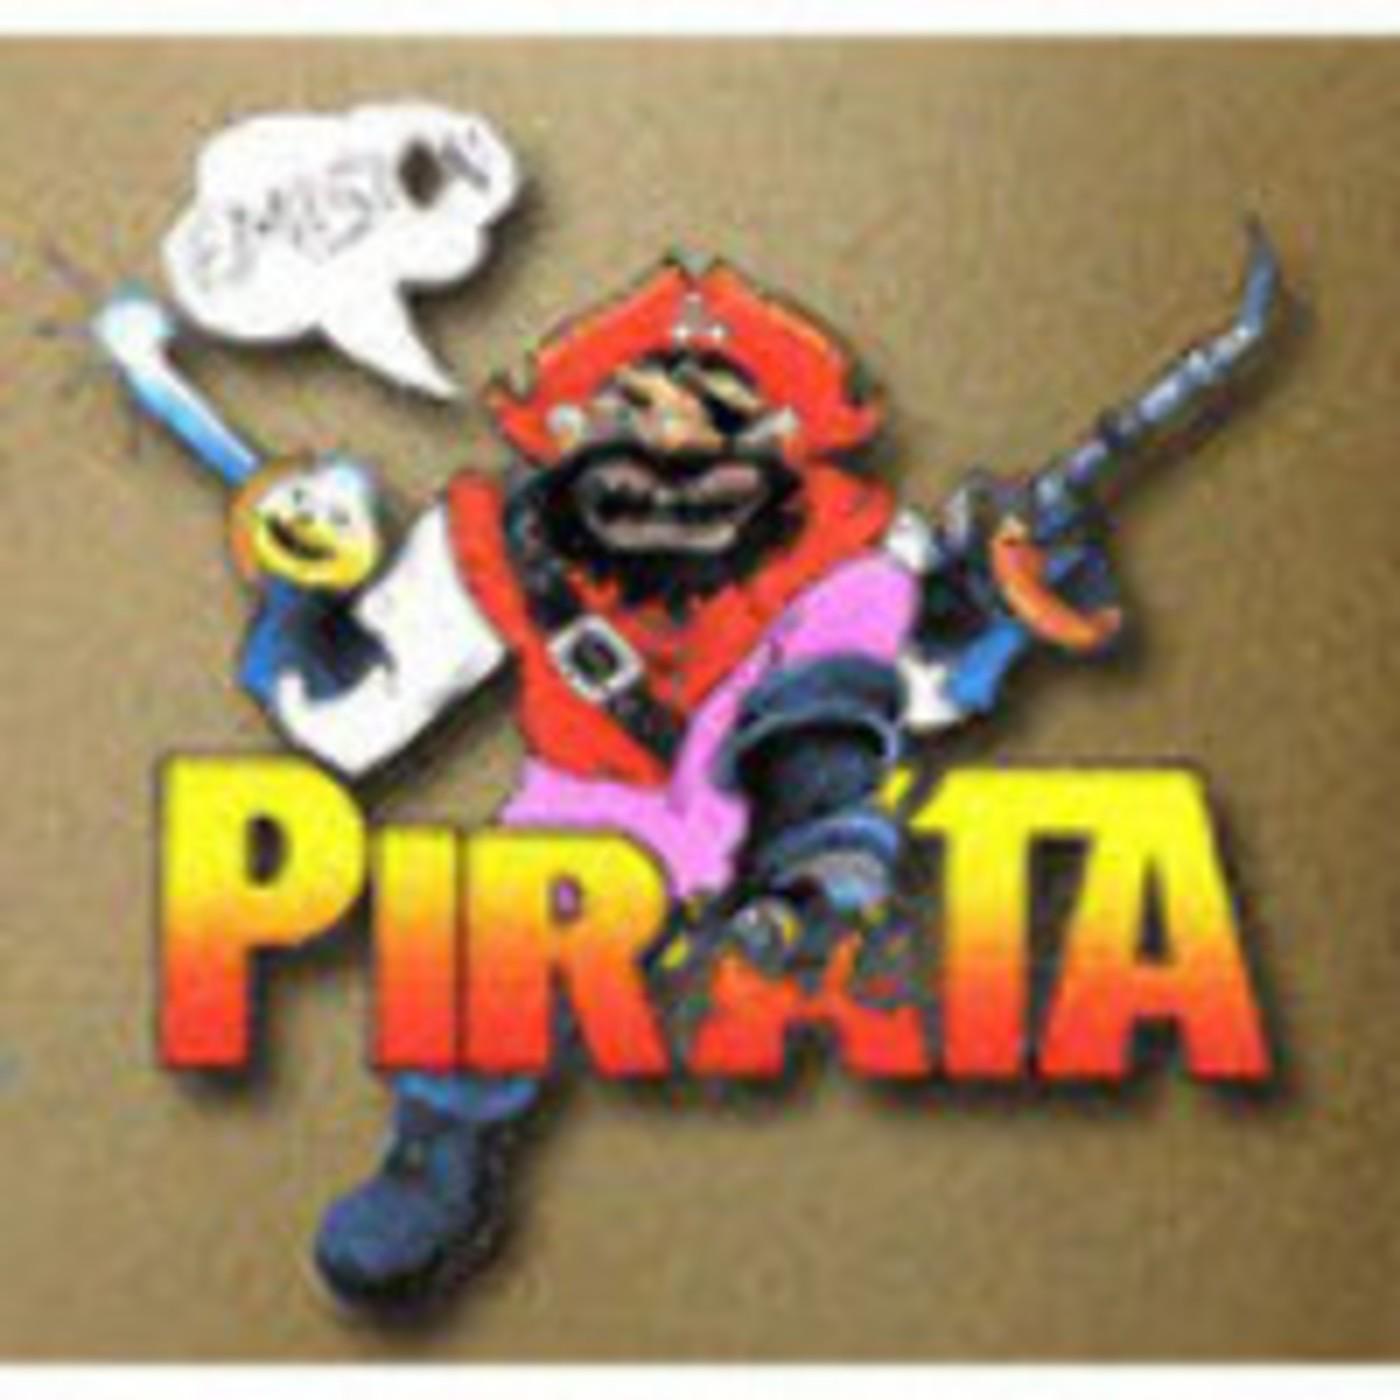 La Emisión Pirata